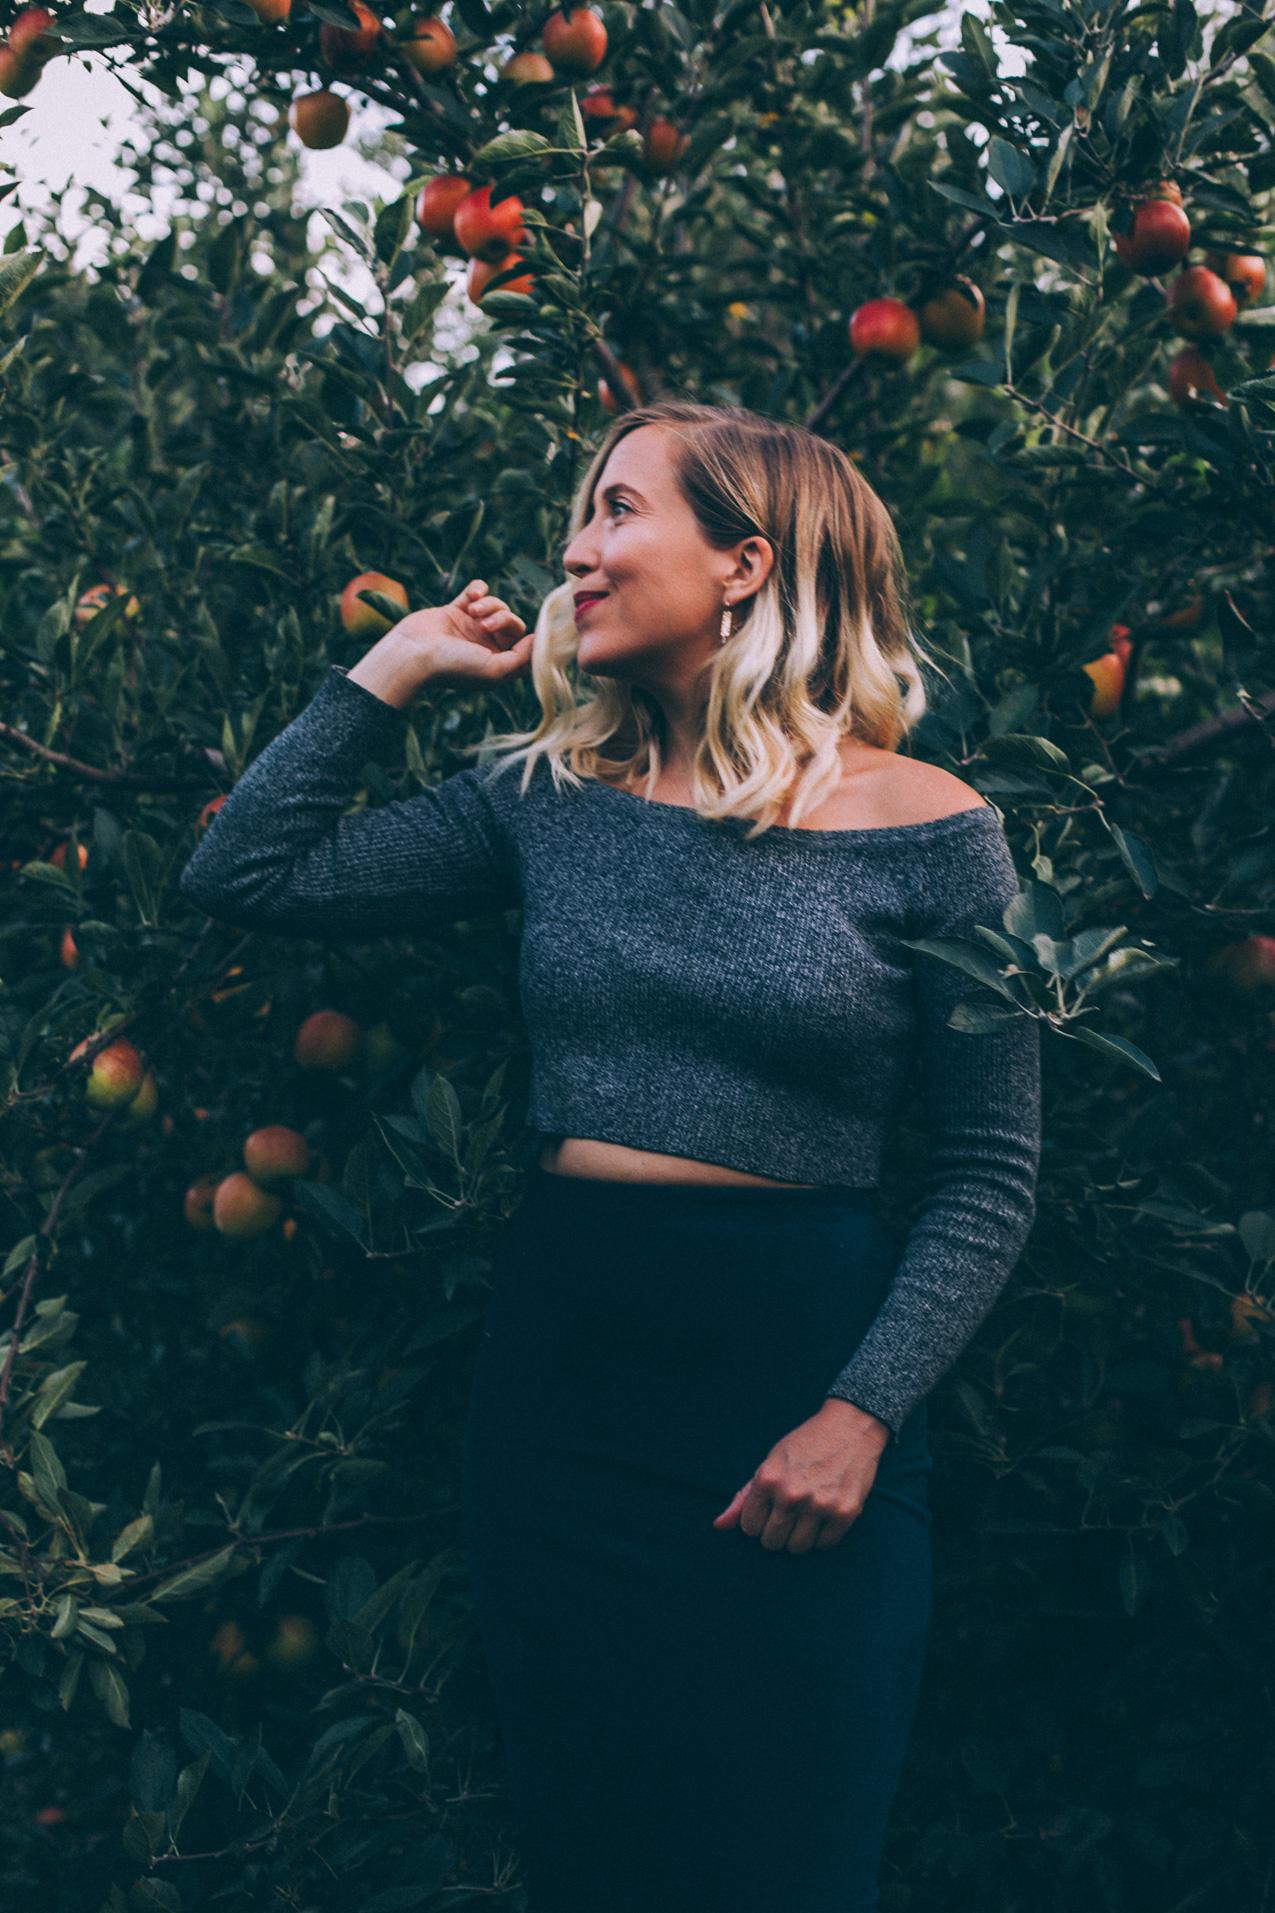 renee-byrd-portraits-carter-mountain-apple-orchard-october-4-2018-5805.jpg